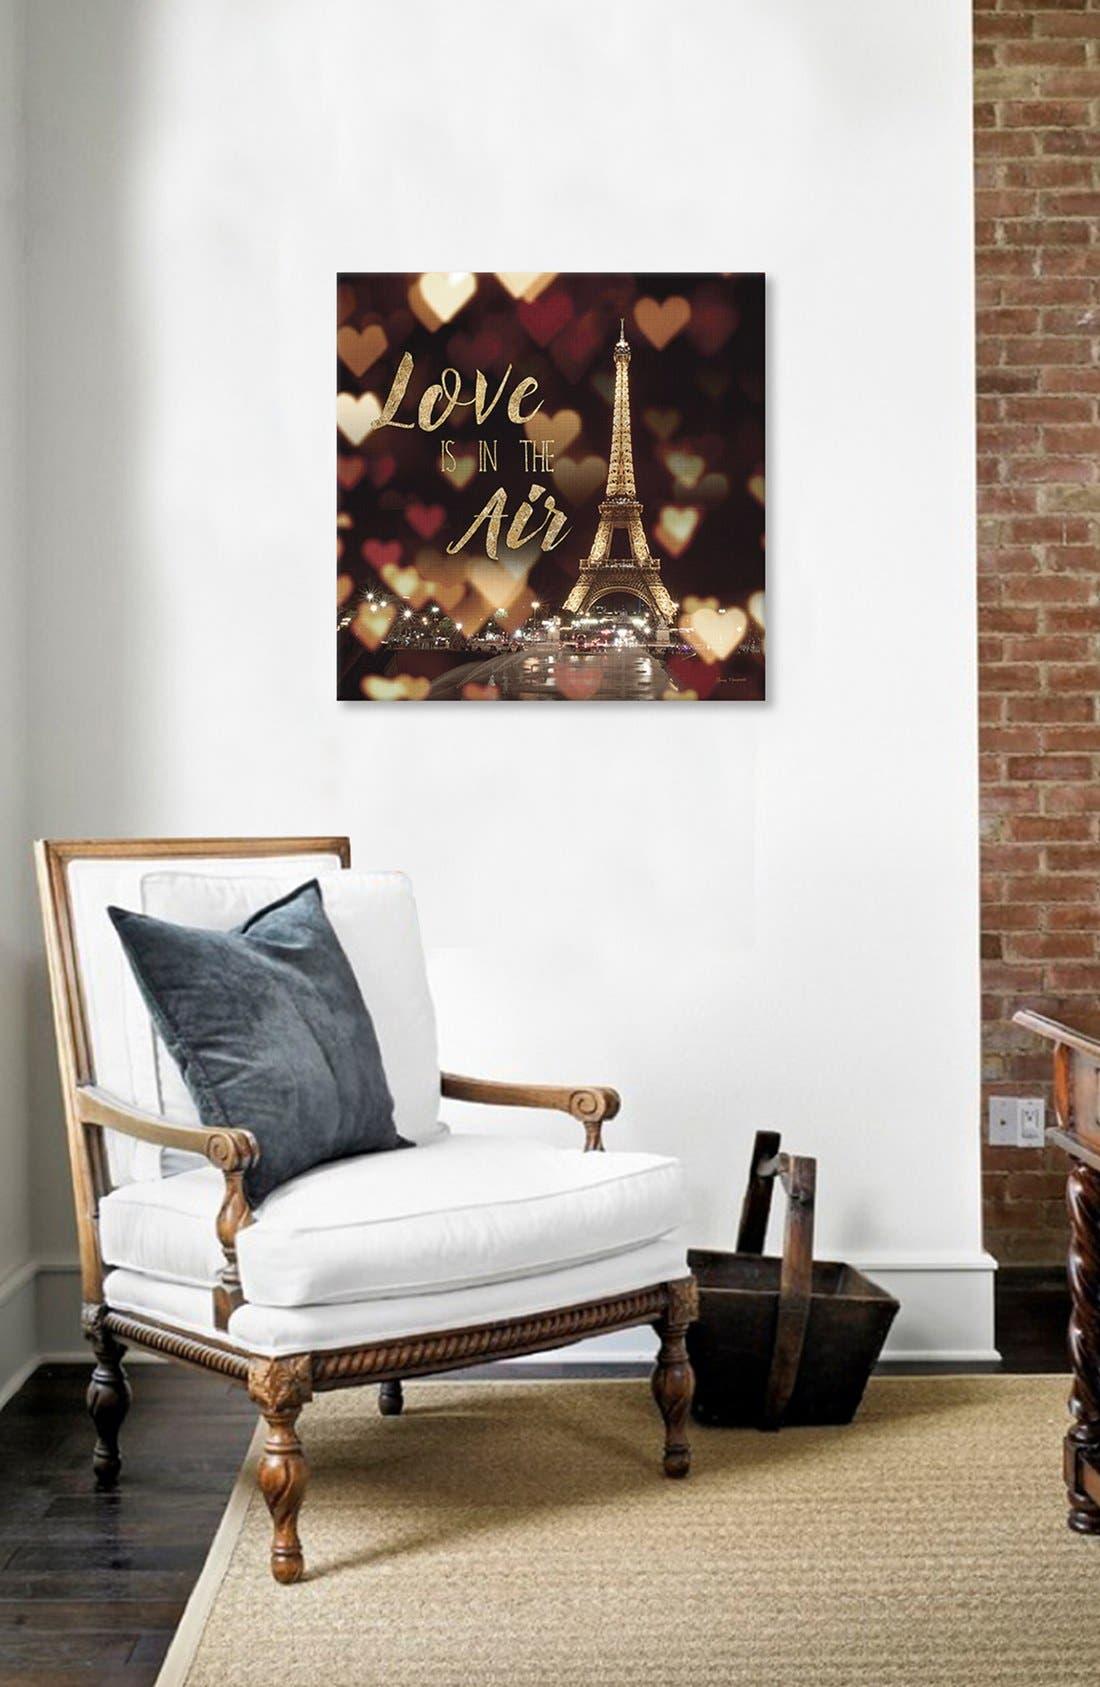 'Love is in the Air' Giclée Print Canvas Art,                             Alternate thumbnail 2, color,                             Black